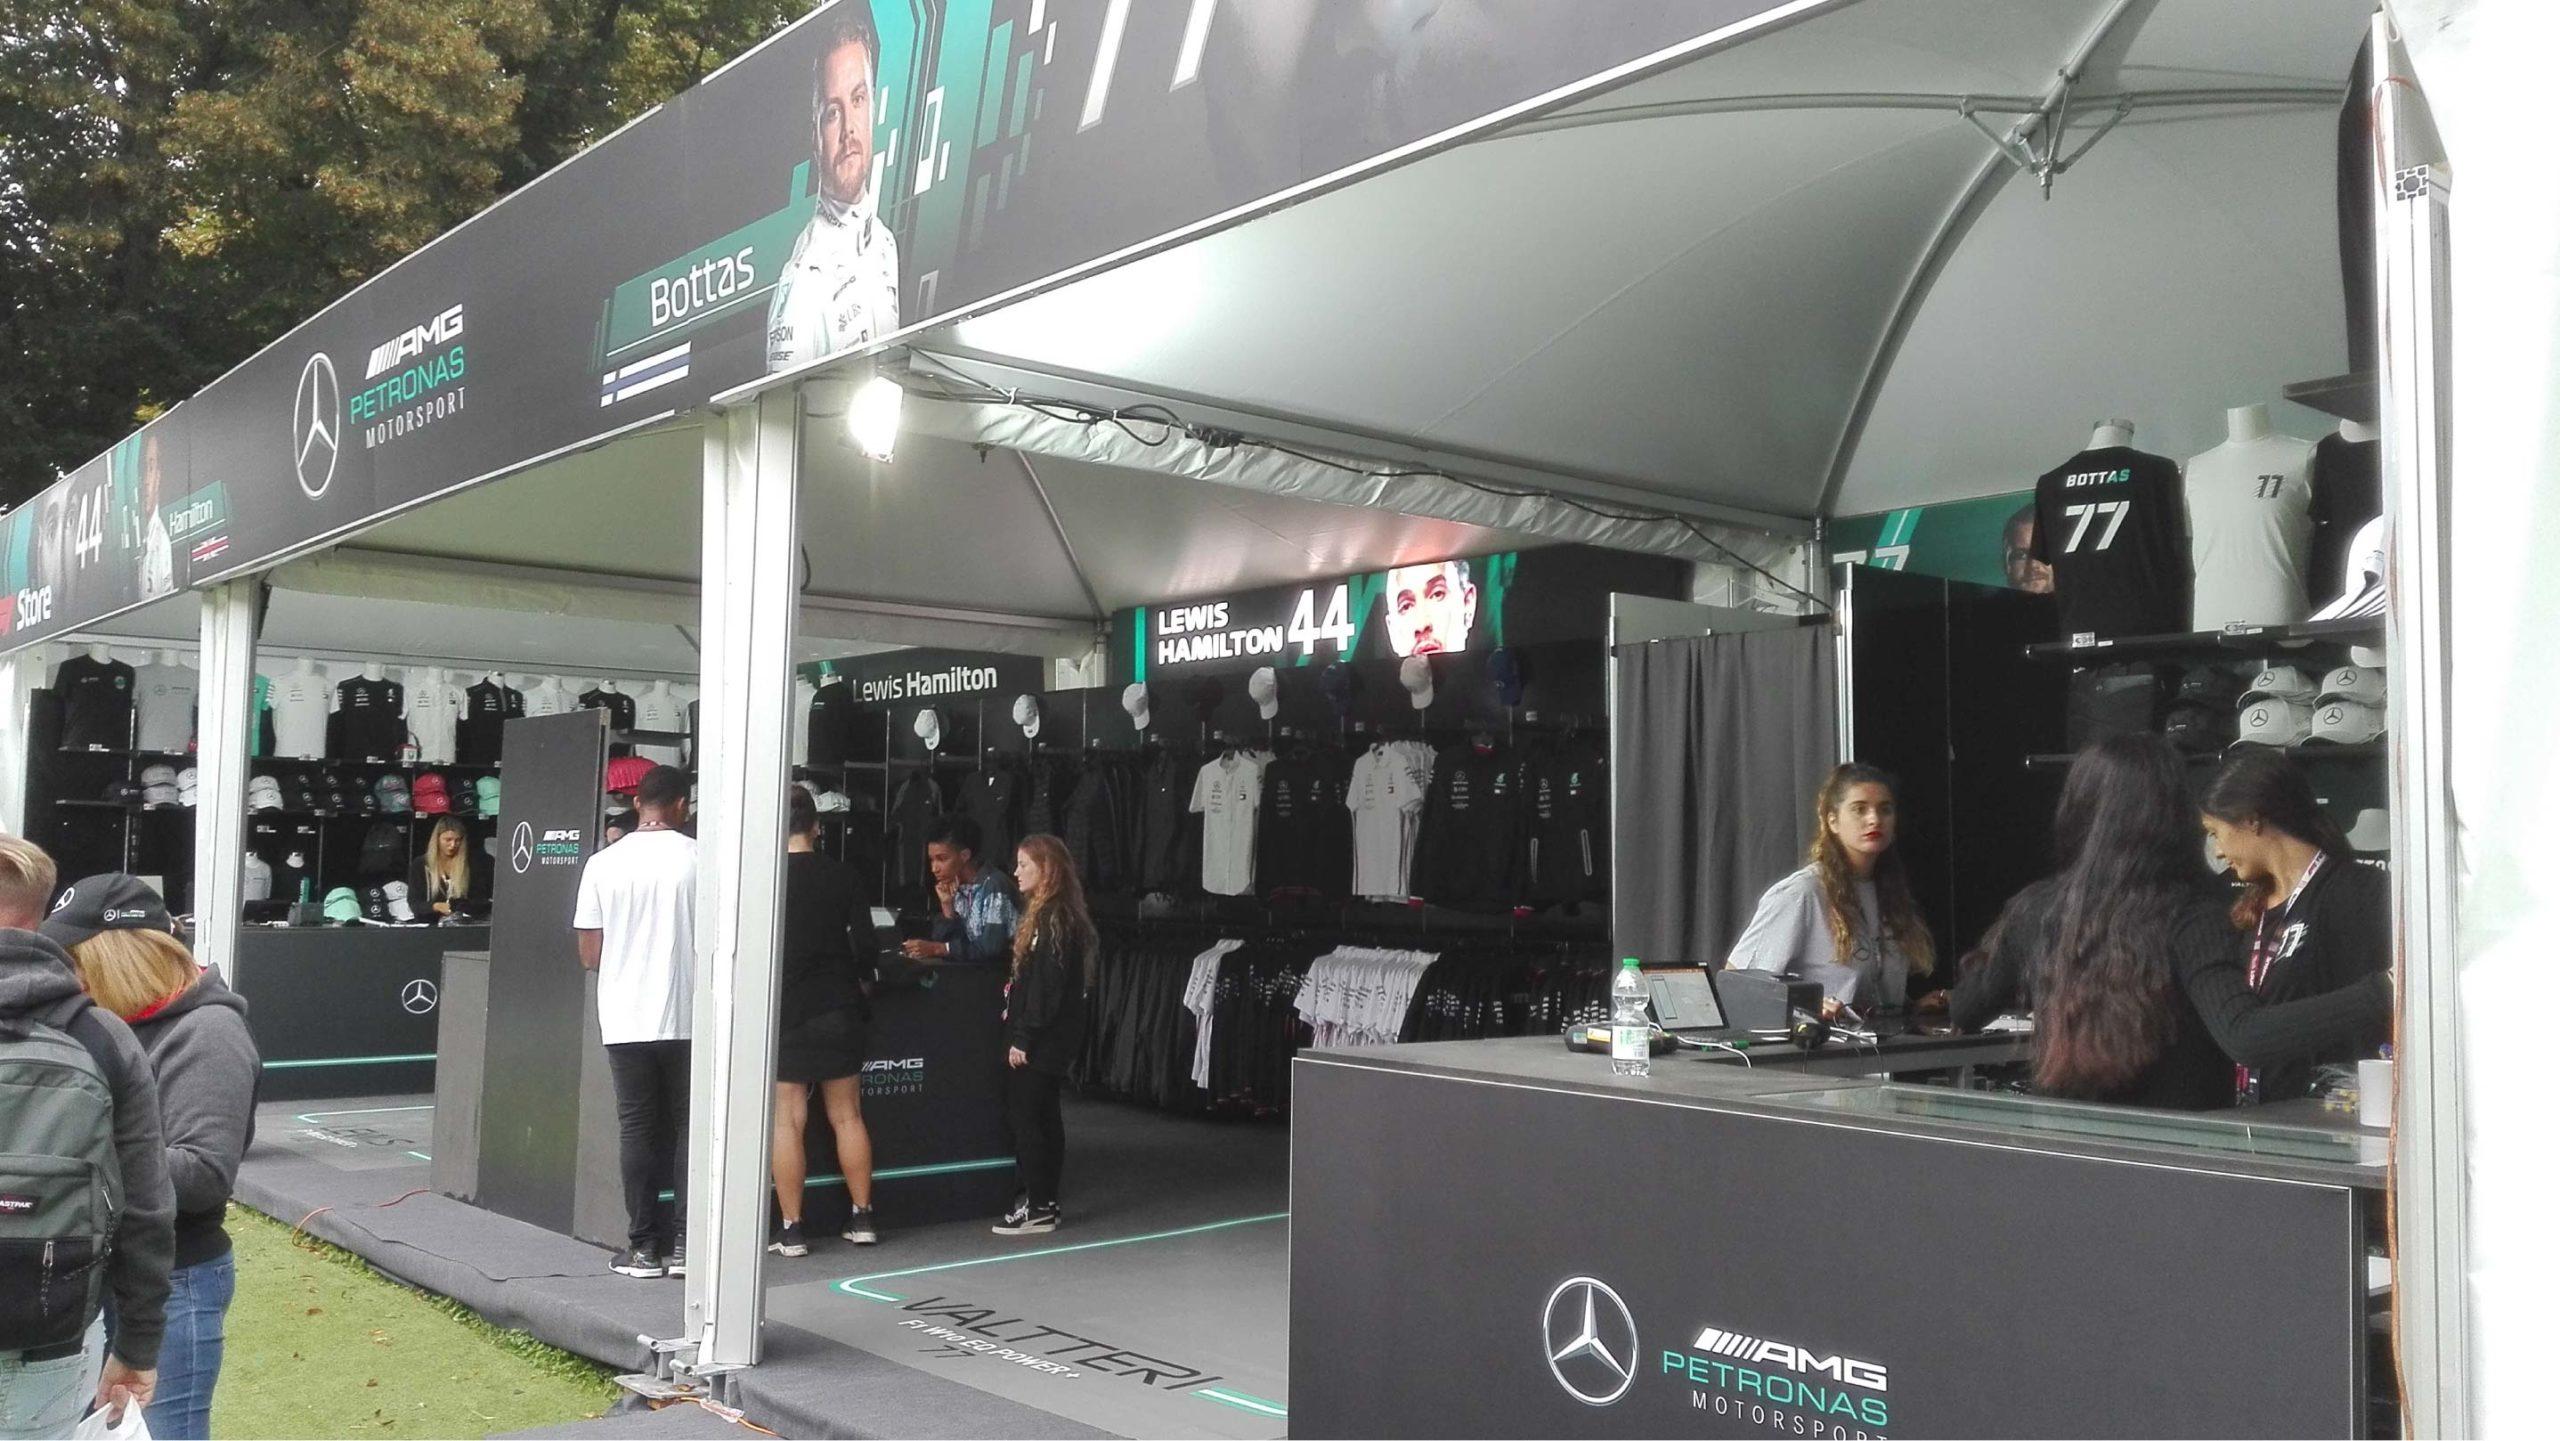 Magasin merchandizing AMG Petronas Motorsport F1 - Monza